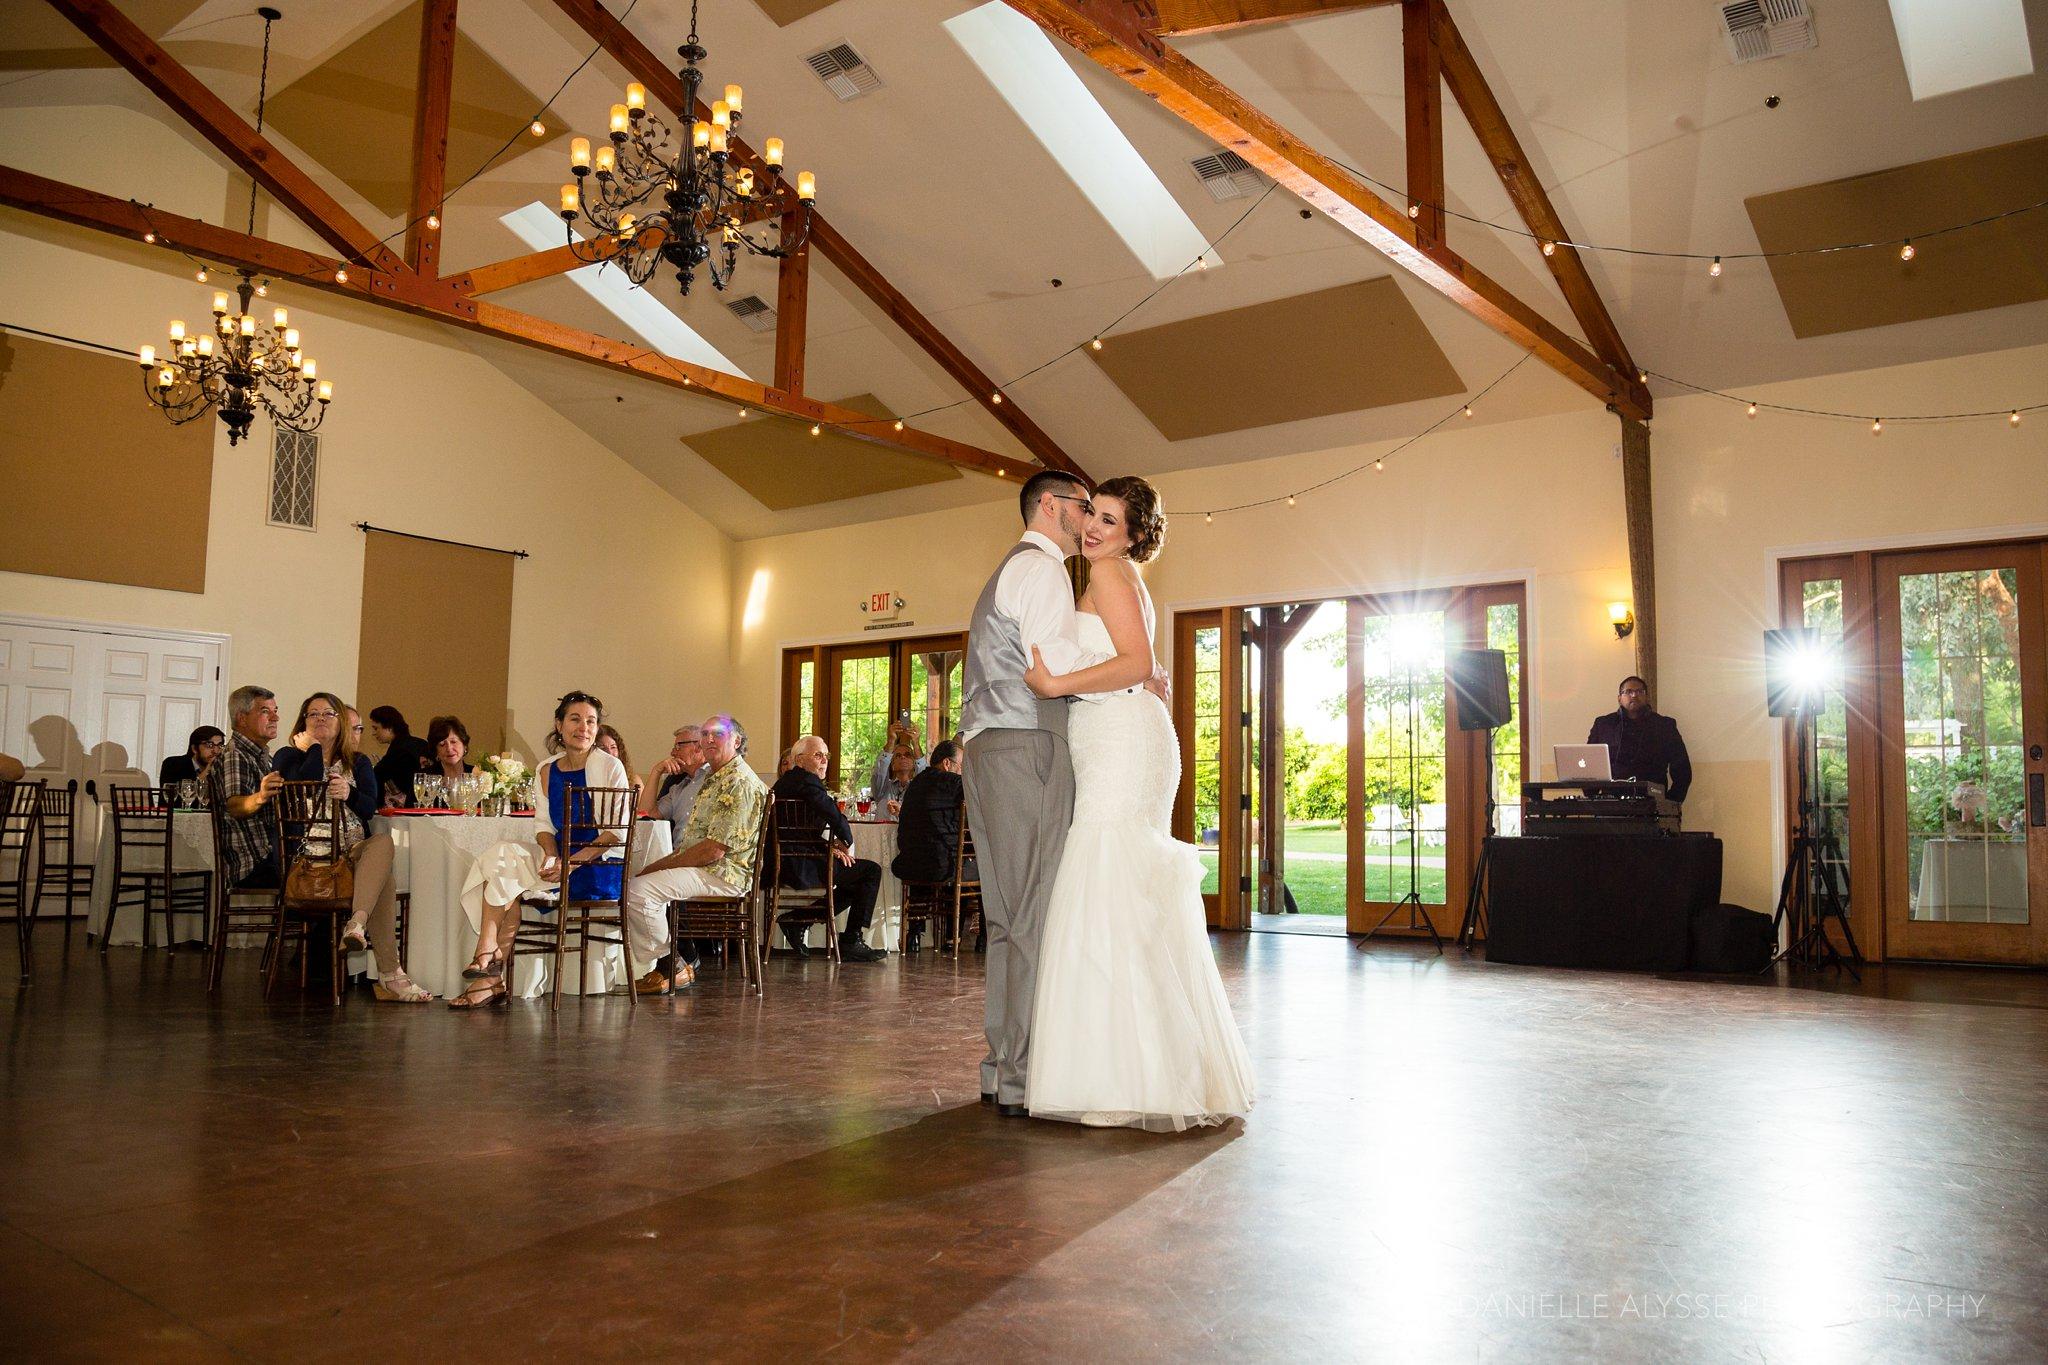 170507_blog_megan_david_wedding_loomis_flower_farm_inn_danielle_alysse_photography_sacramento_photographer0459_WEB.jpg